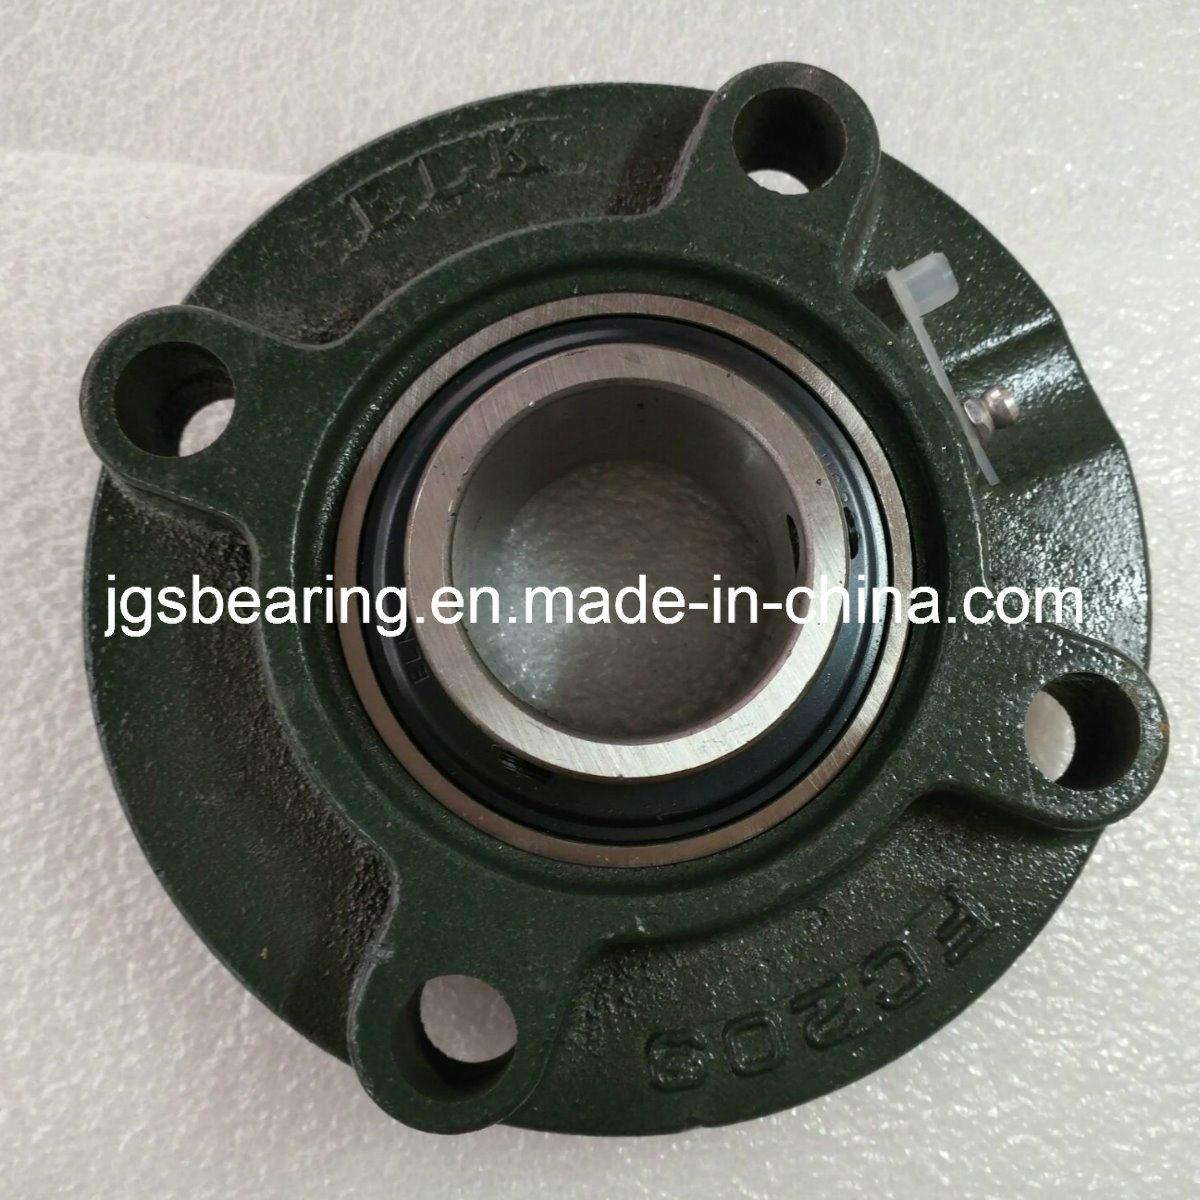 s base bearing pillow bearings axd block pa tapped transmission power l